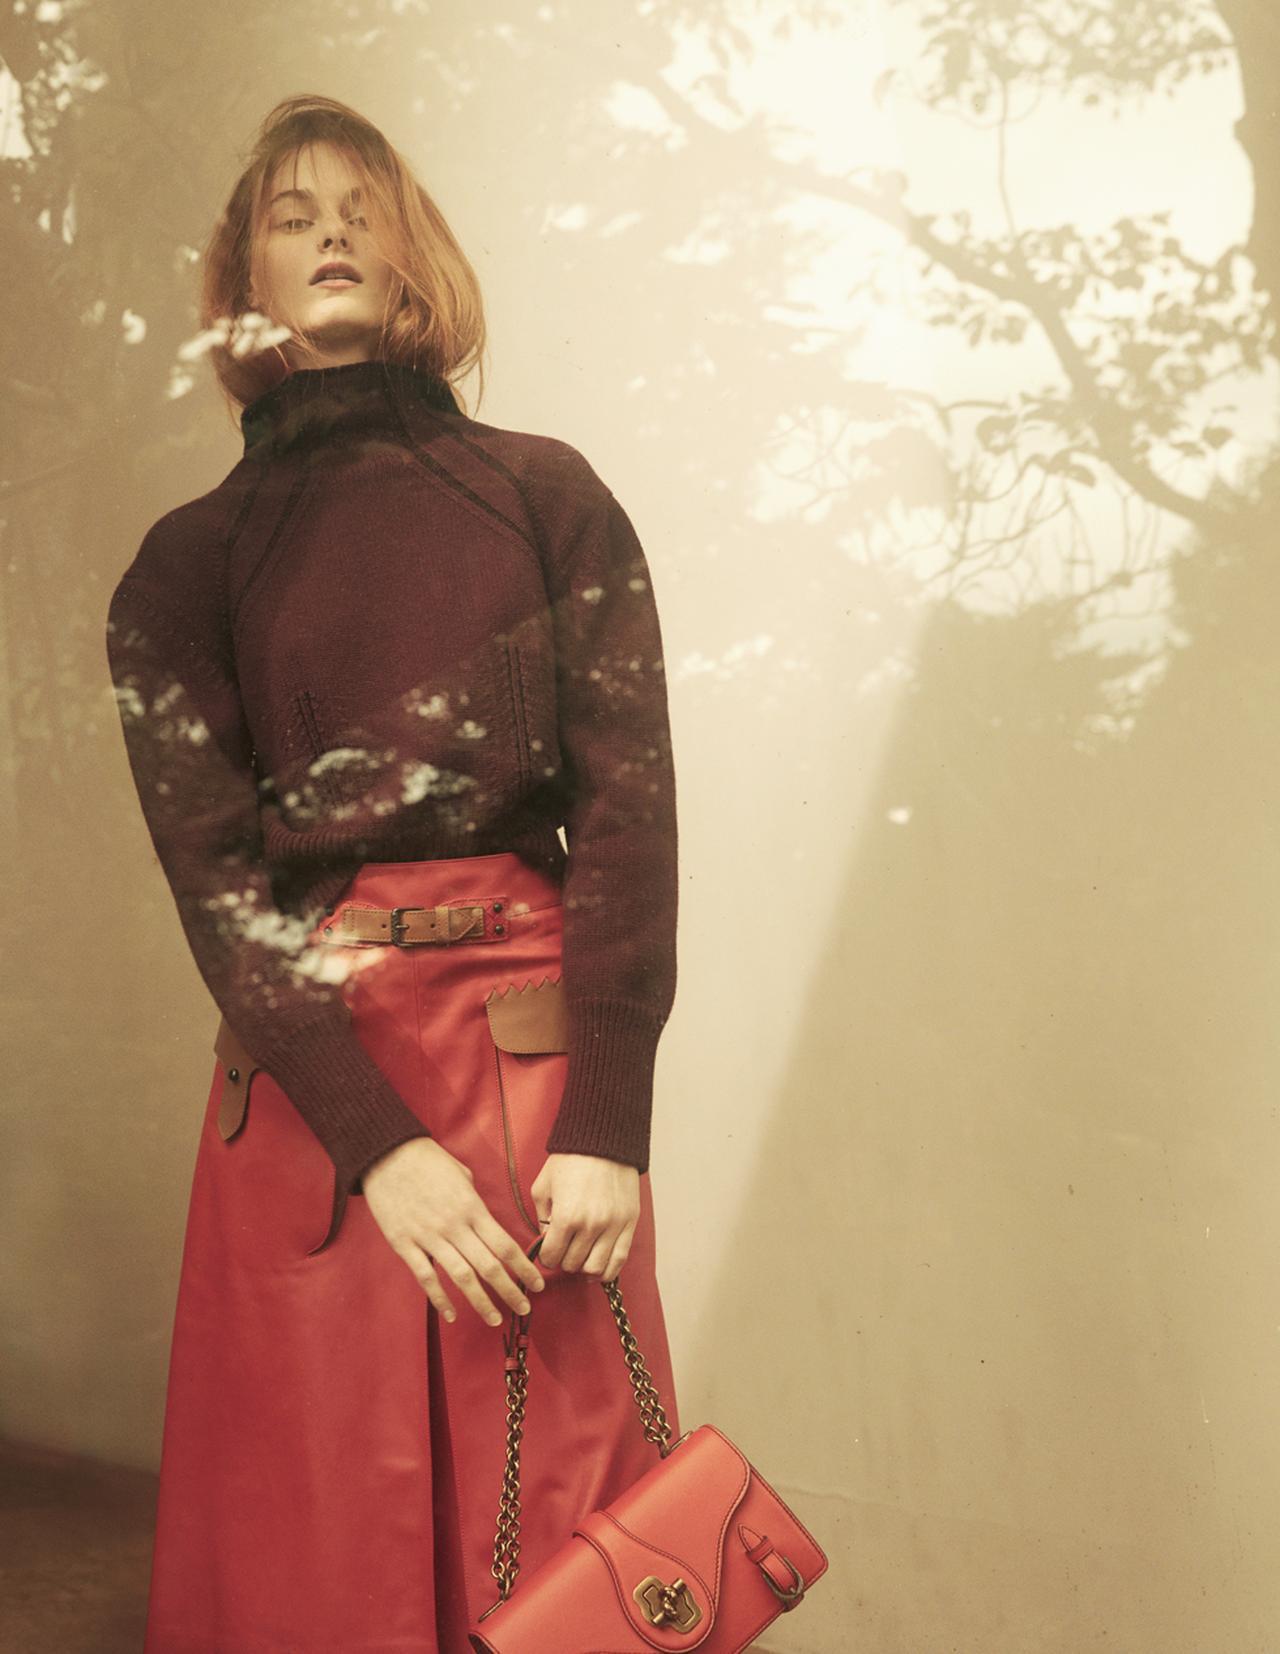 Images : 5番目の画像 - 「冬の陽だまり、まどろみの午後」のアルバム - T JAPAN:The New York Times Style Magazine 公式サイト